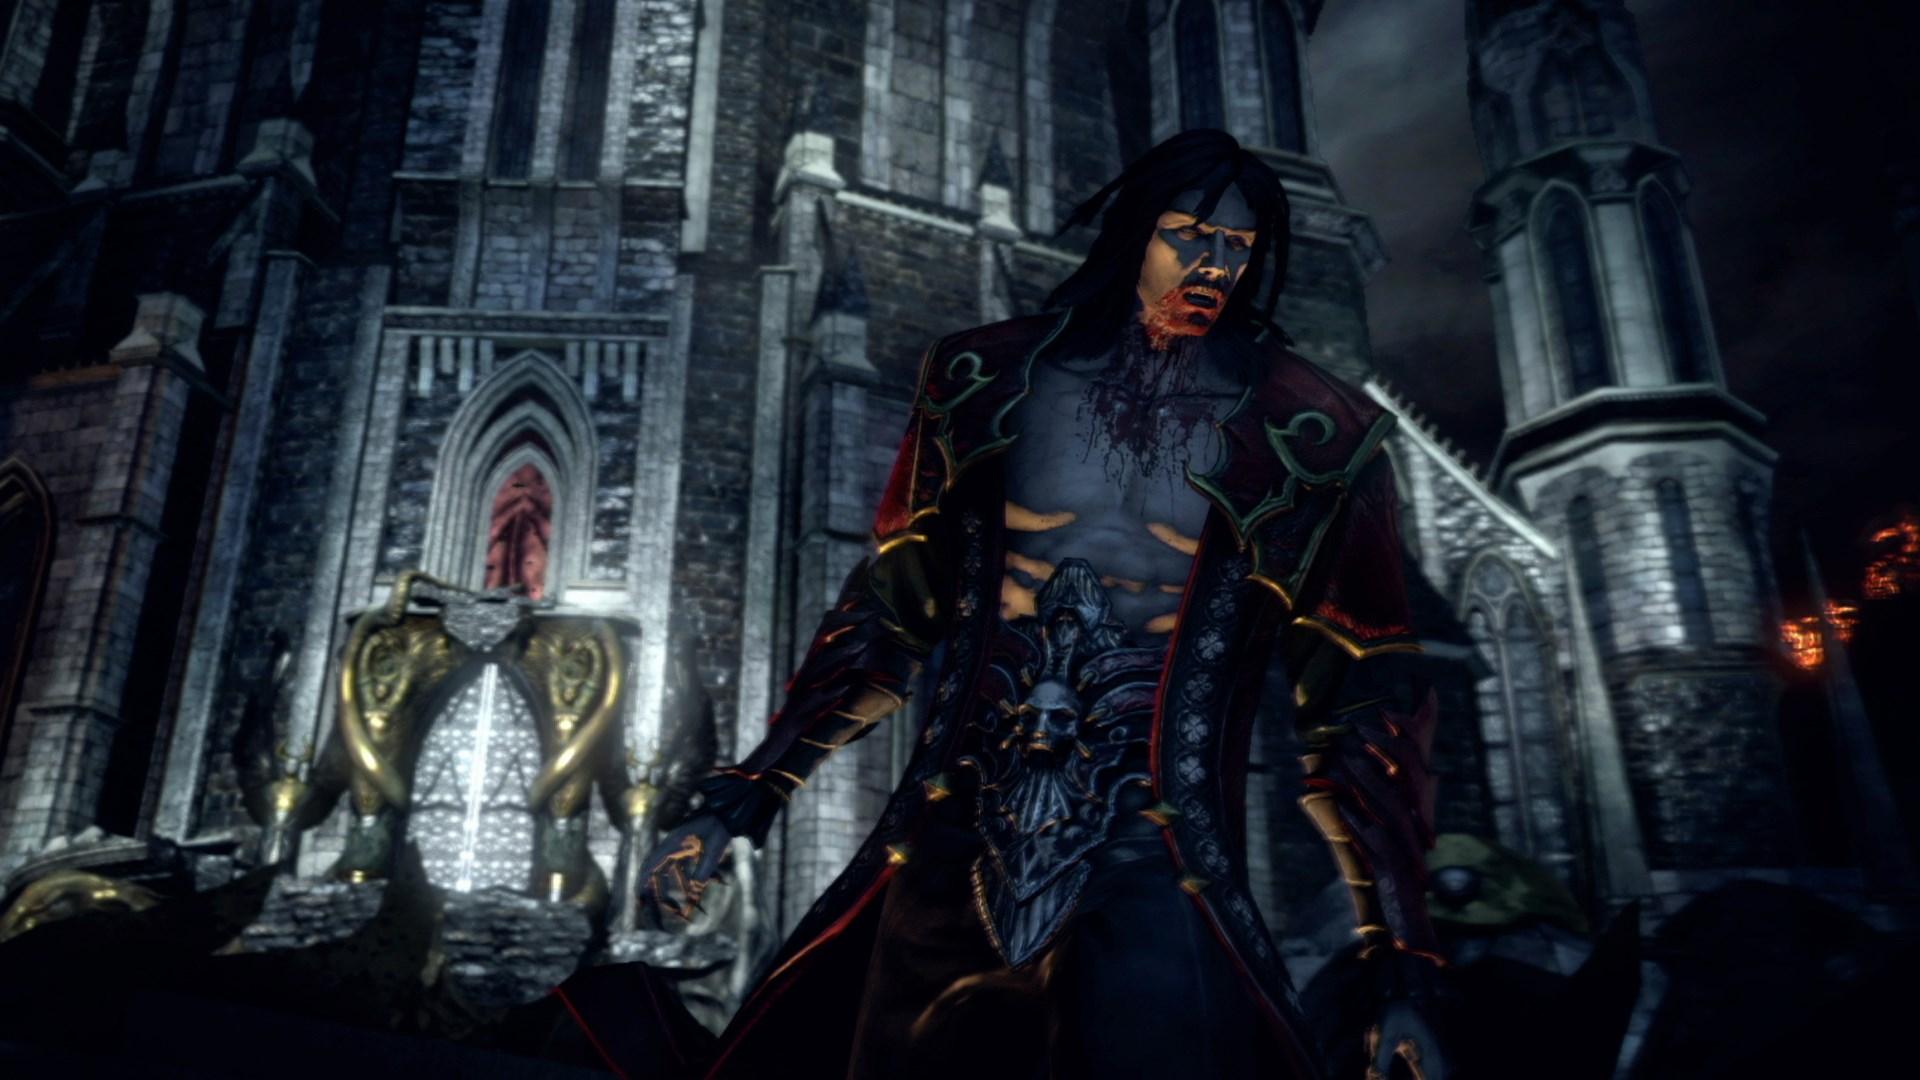 Screenshoty z Castlevania: Lords of Shadow 2 83318